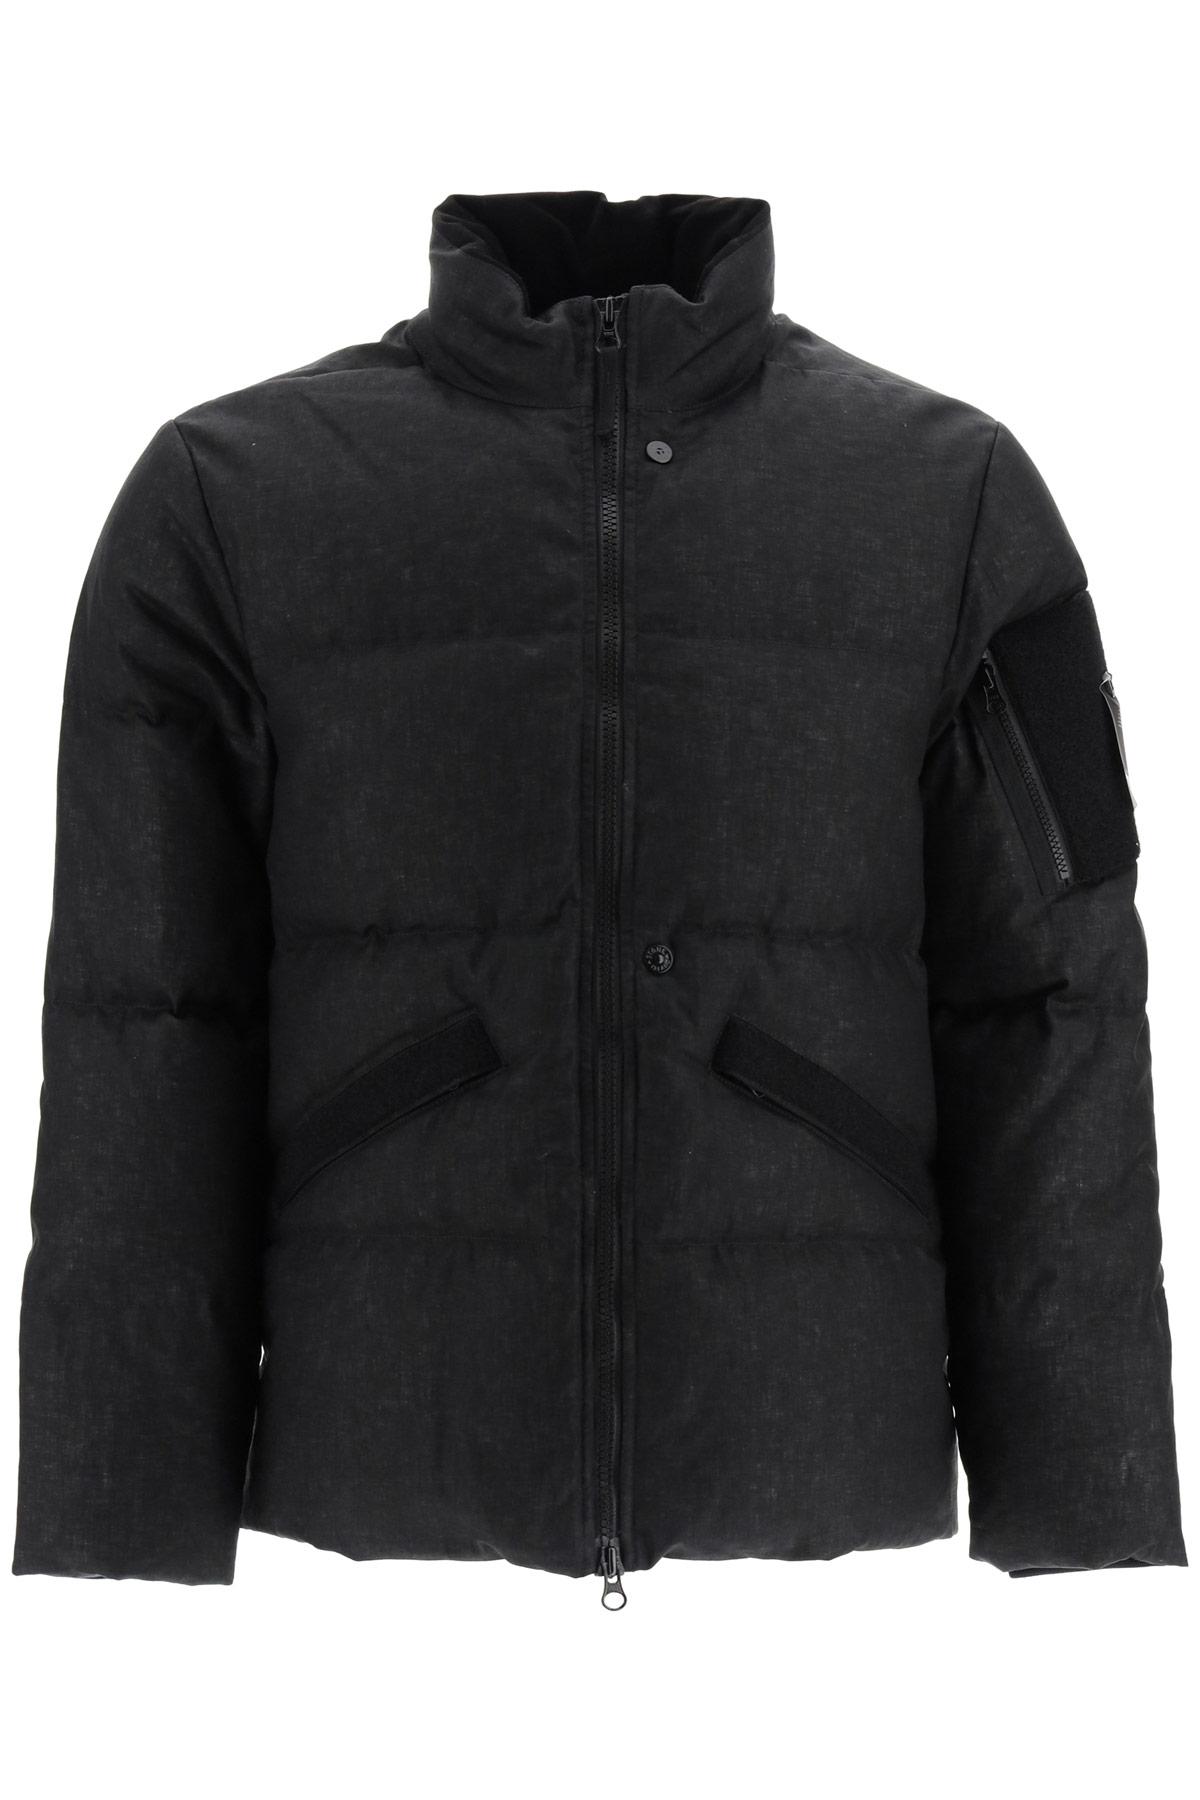 STONE ISLAND SHADOW PROJECT 남자 아우터 점퍼 Puffer jackets MO7319403B1 V0029